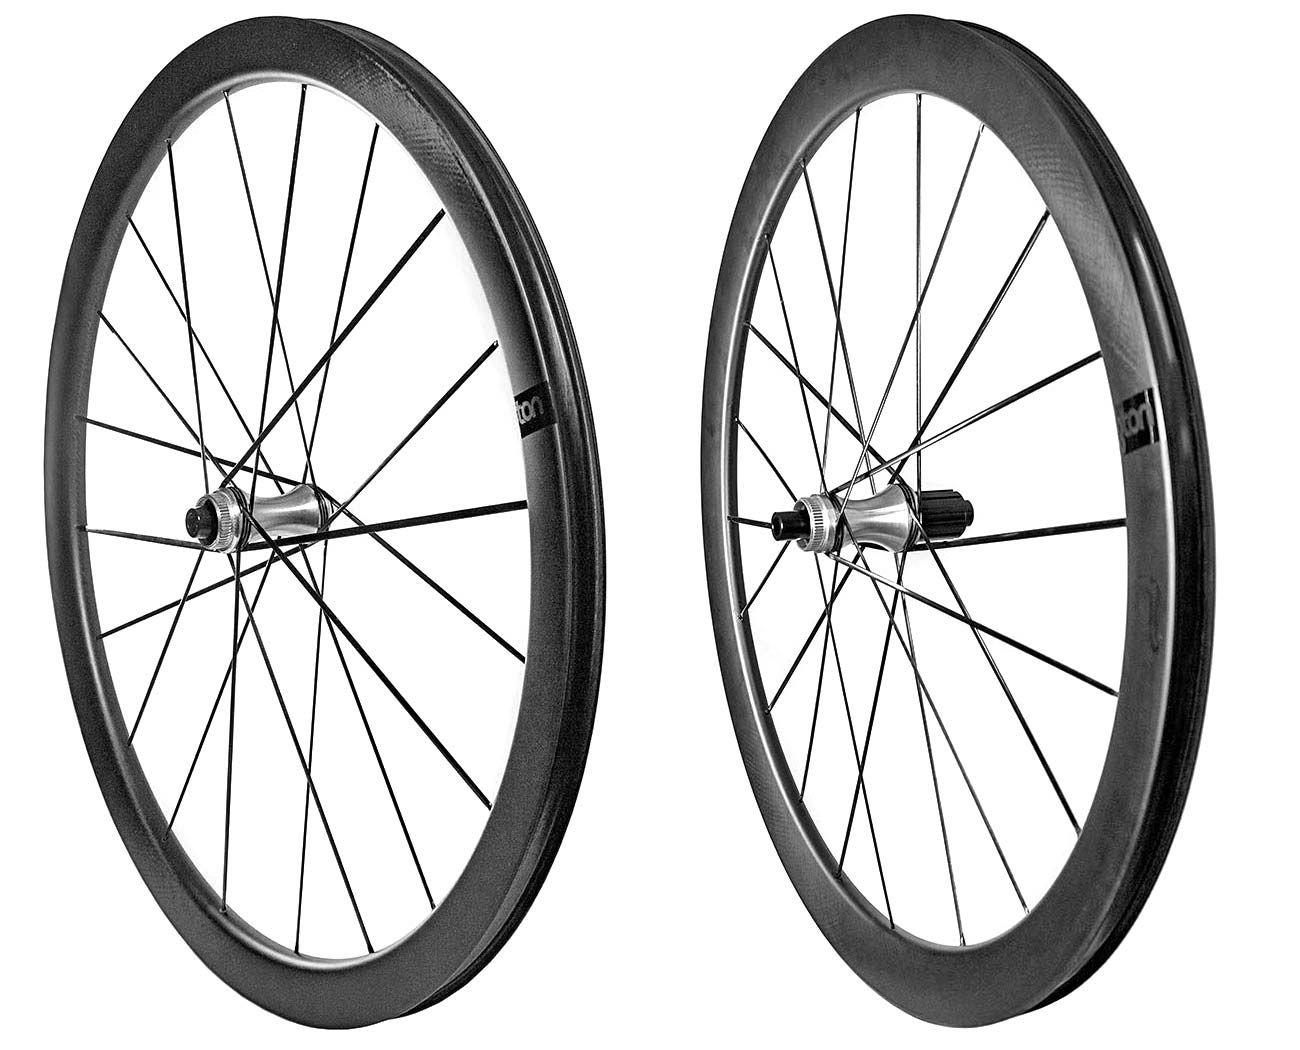 Partington Adv Eng 39r 44r Australian Ultralight Carbon Spoked Aero Road Wheels Bikerumor Ultralight Wheel Carbon